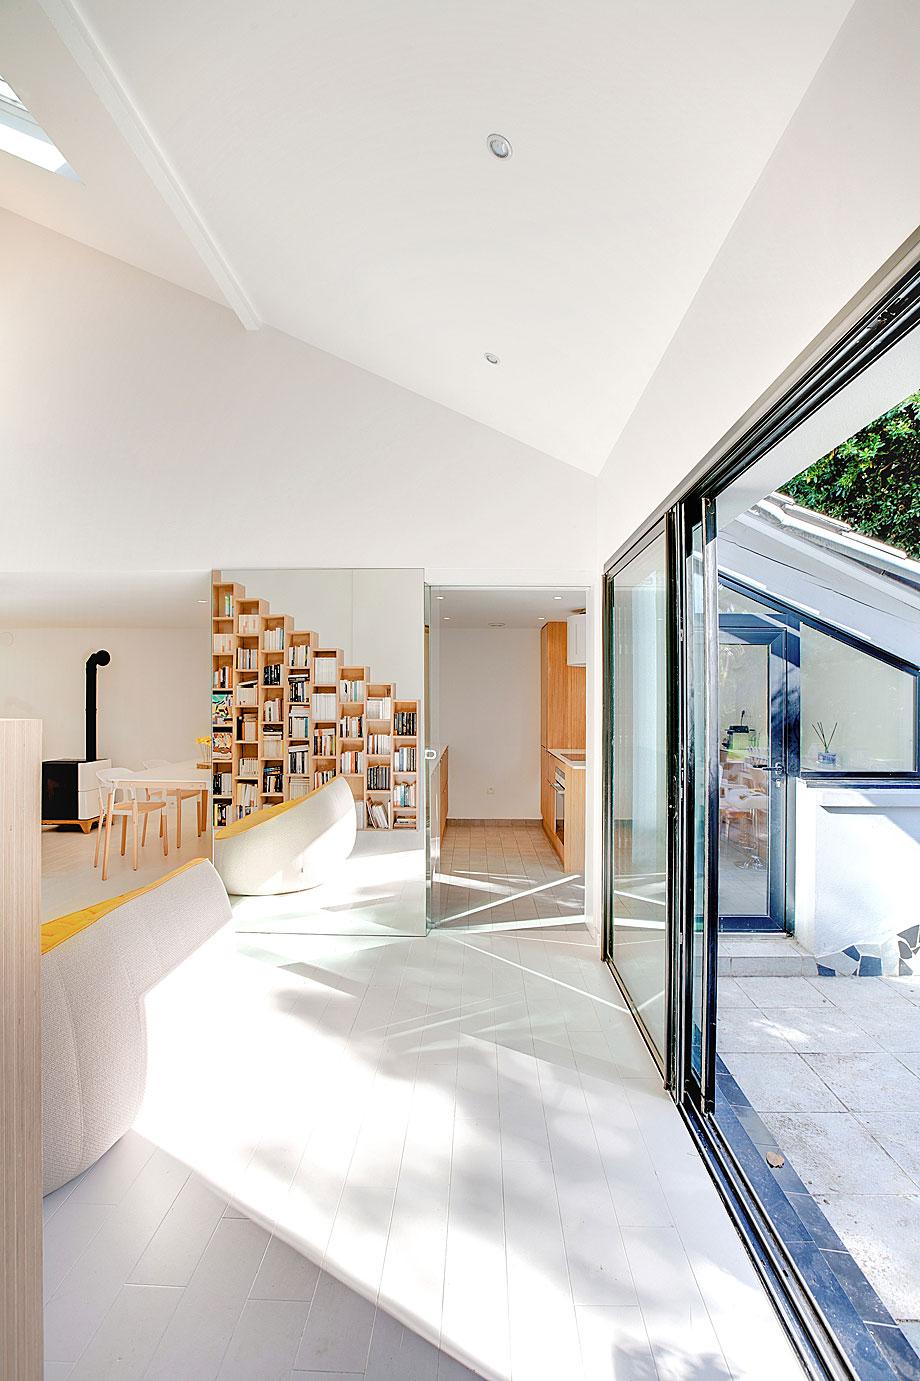 bookshelf-house-andrea-mosca-6